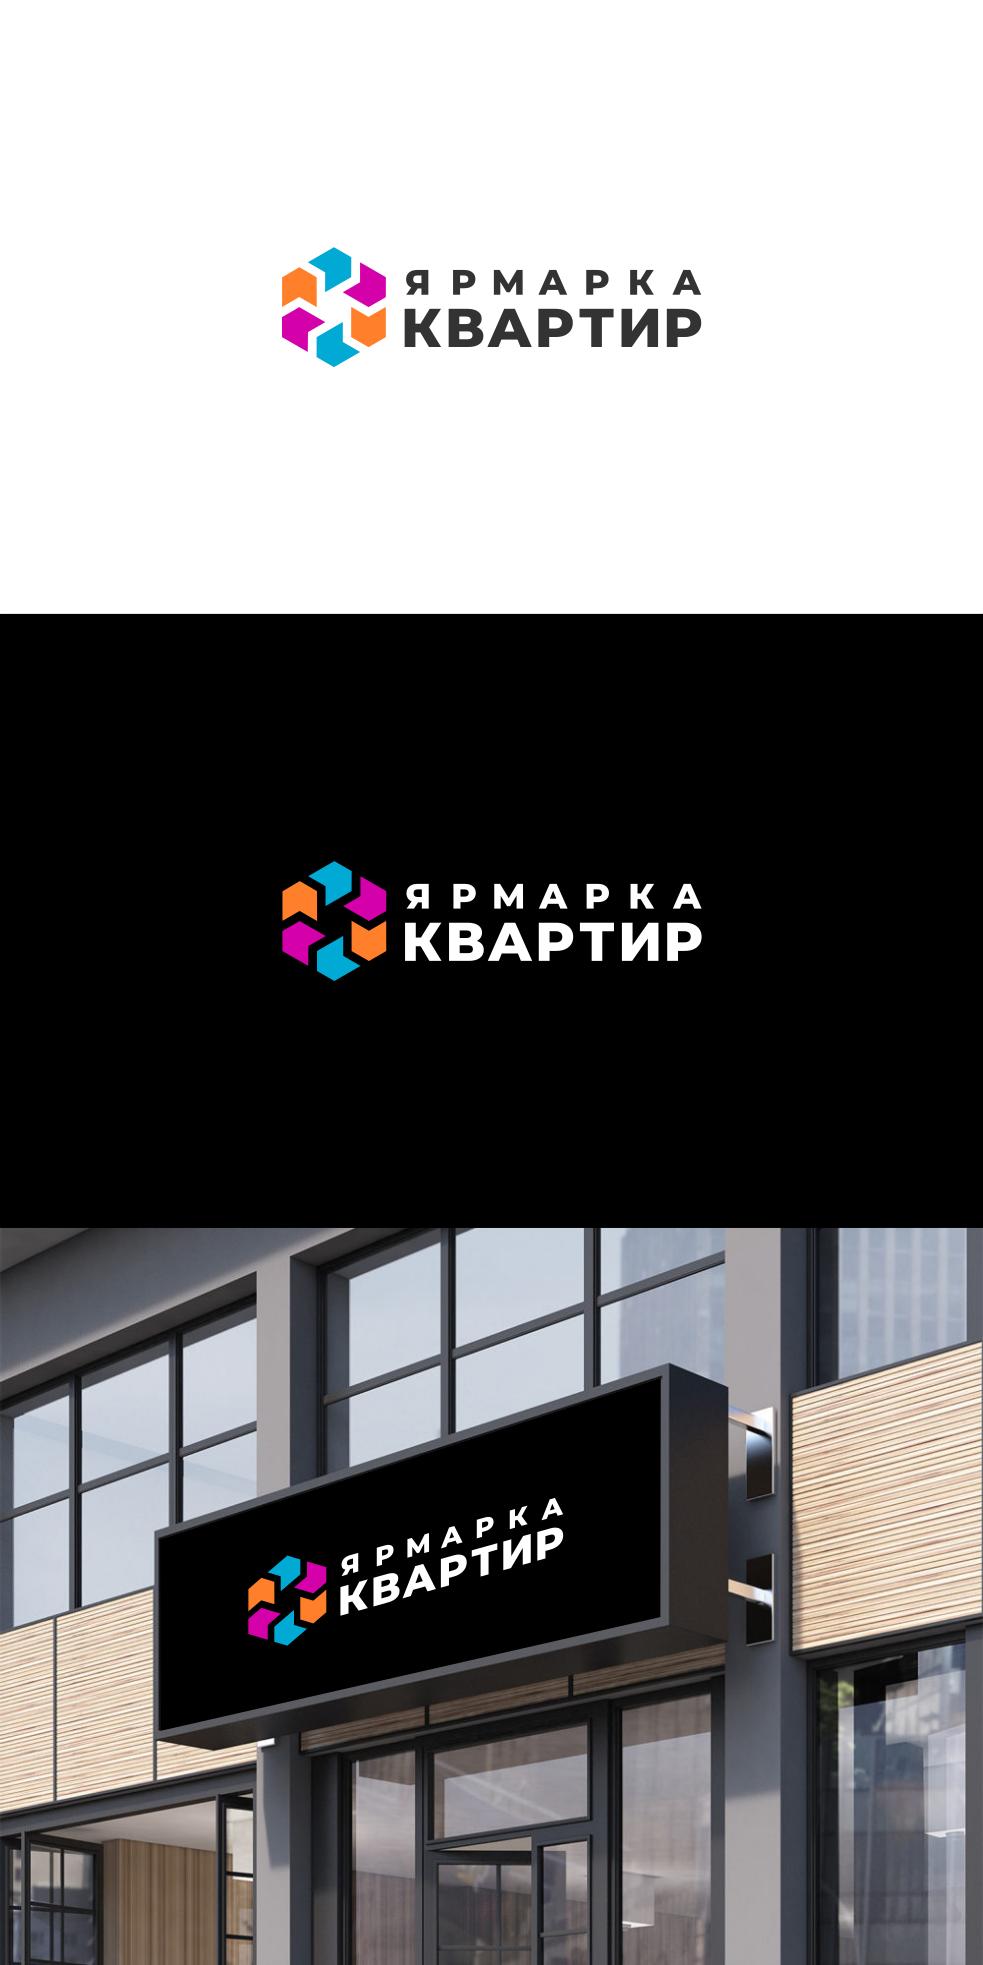 Создание логотипа, с вариантами для визитки и листовки фото f_6936006b223c358b.png